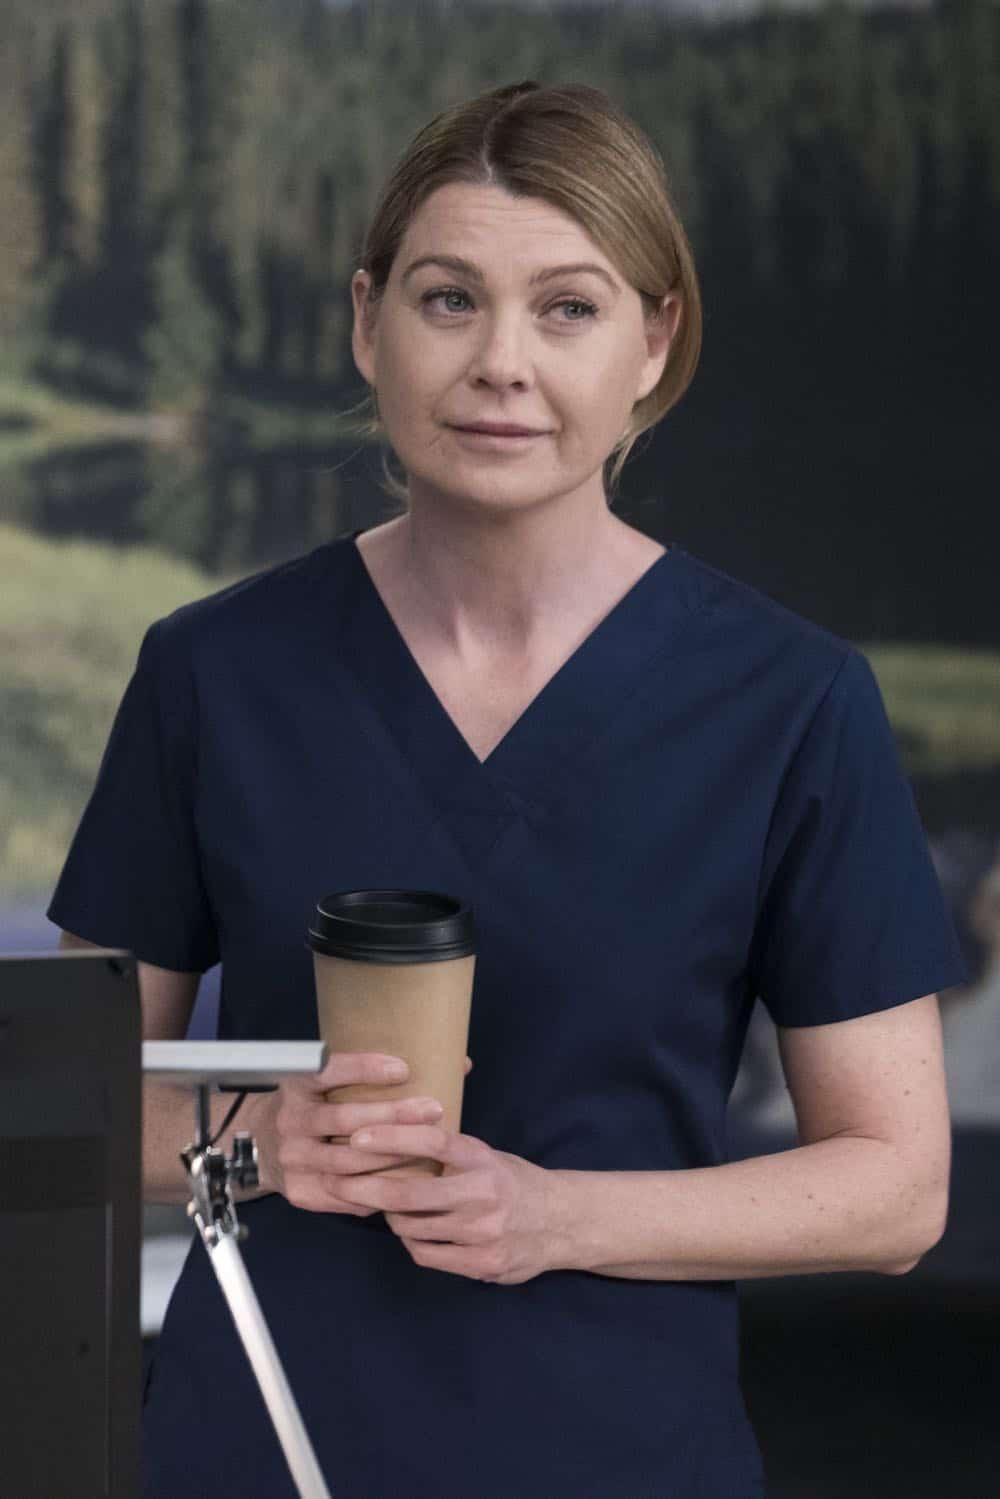 Greys Anatomy Episode 21 Season 14 Bad Reputation 16